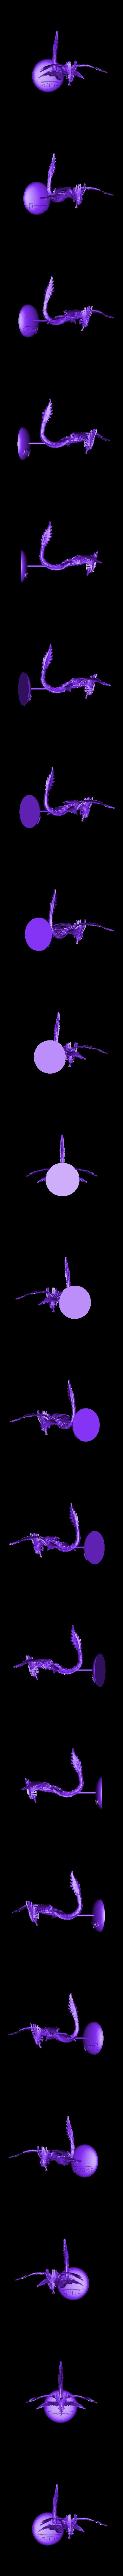 Kukulkan_Merged_Preview.stl Download free STL file SMITE Kukulkan Statue • 3D printable object, Solid_Alexei